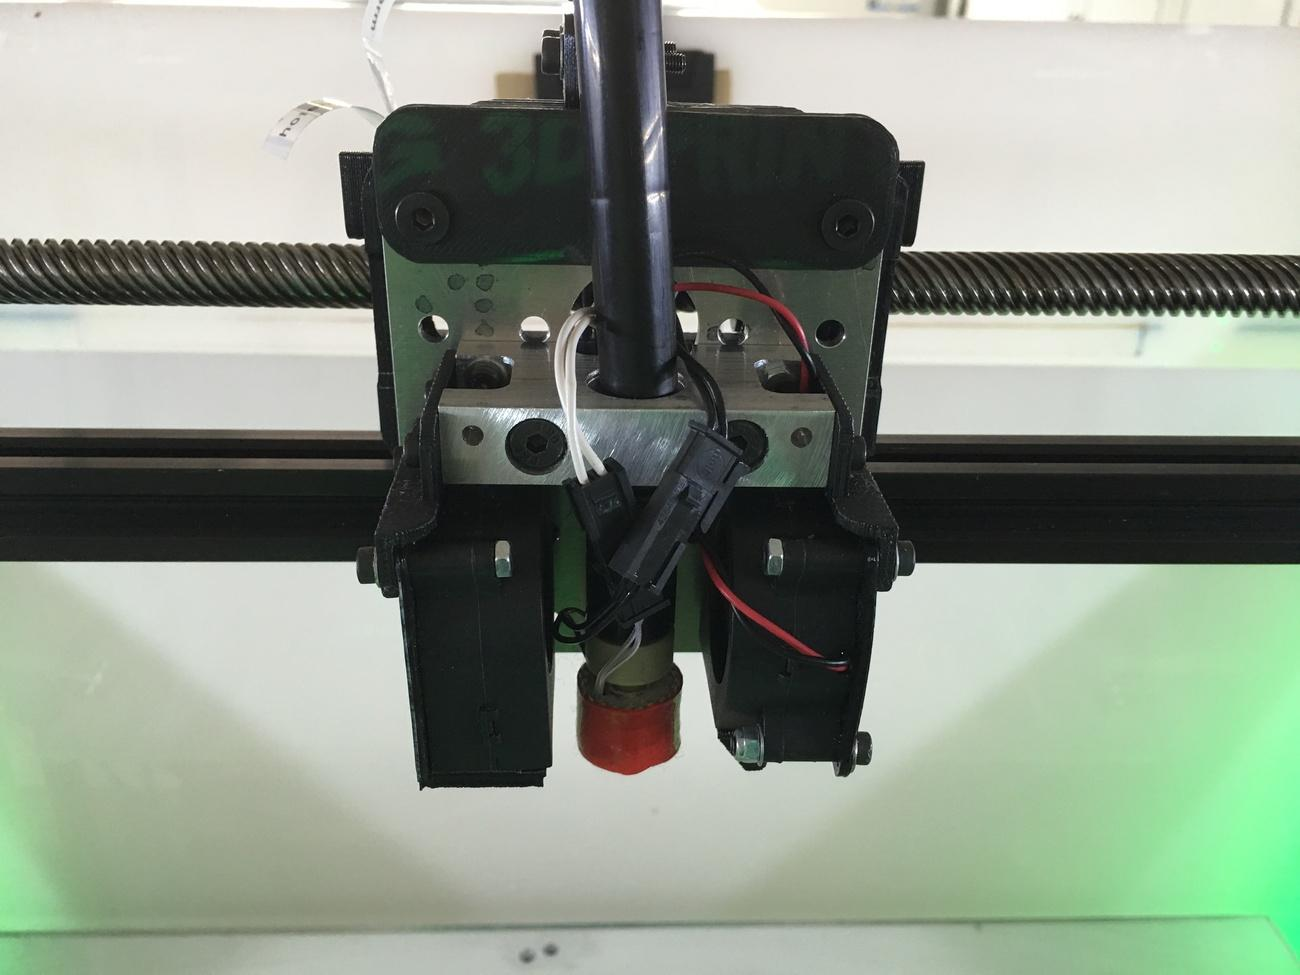 8 Cubic Feet All-in-One Go Big 3D Printer